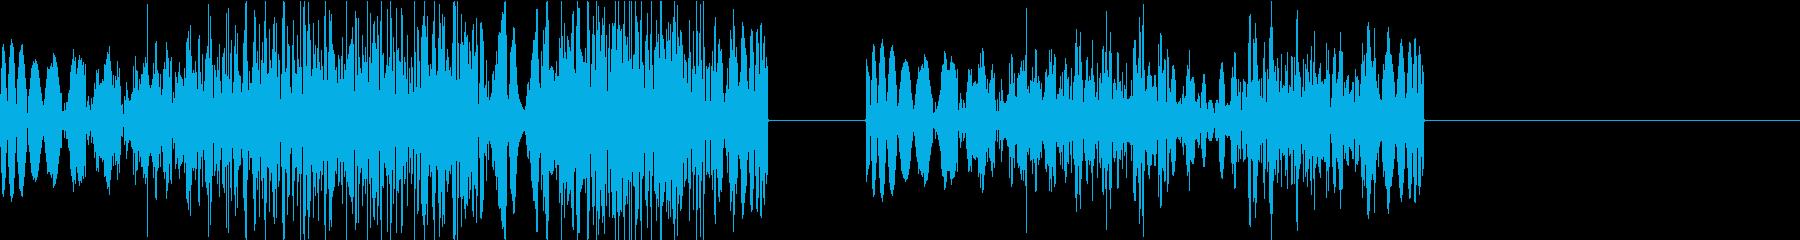 DJプレイ スクラッチ・ノイズ 310の再生済みの波形